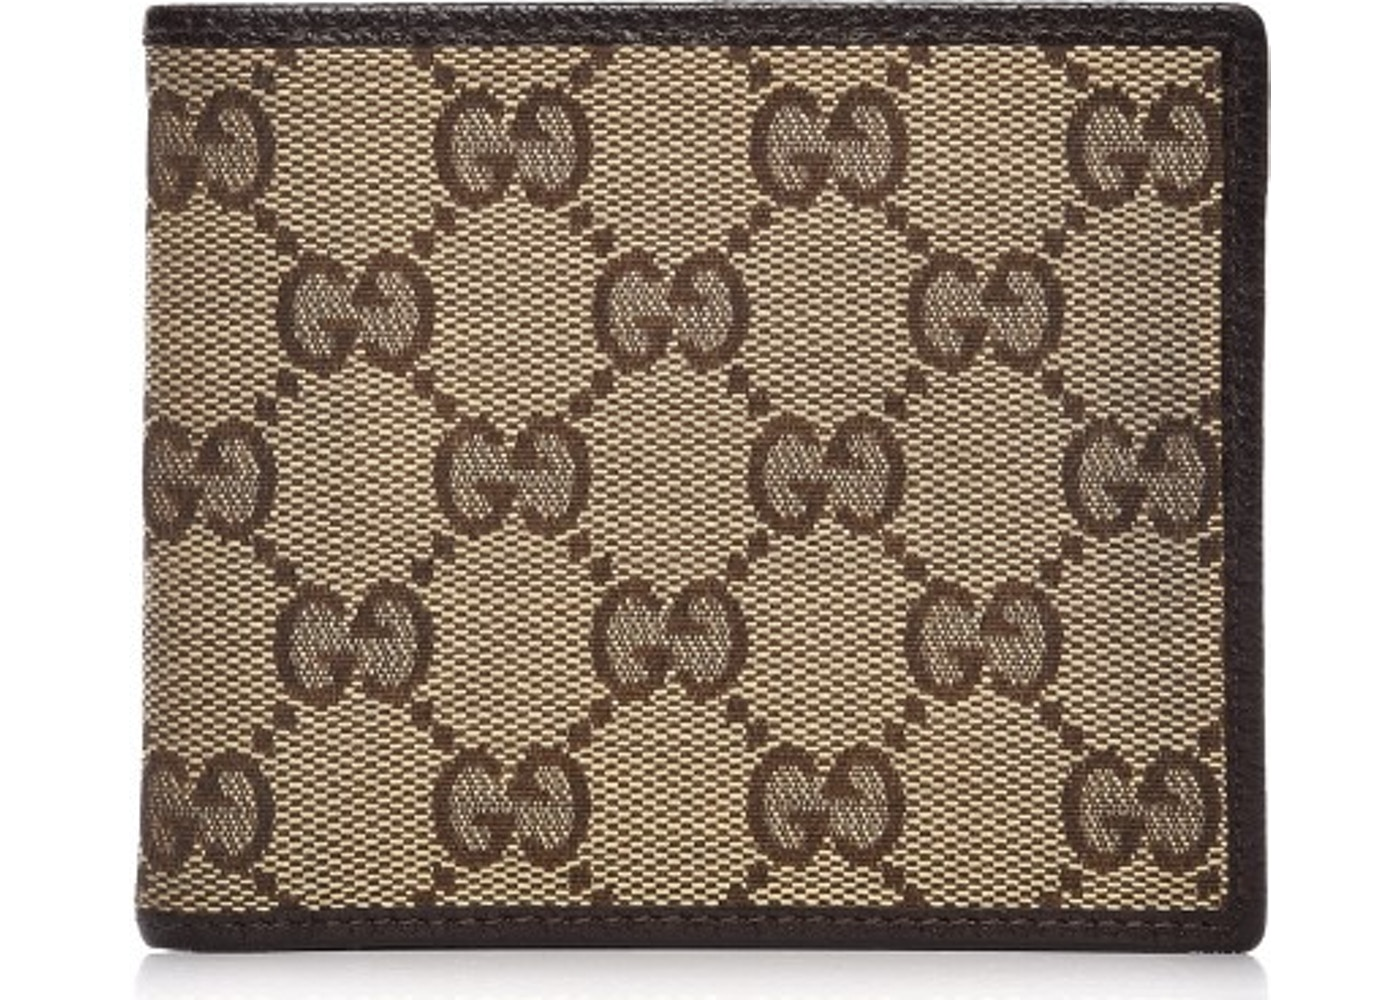 d62faf7ce64d Gucci Mens Bifold Wallet Monogram Gg Brown/beige | Stanford Center ...